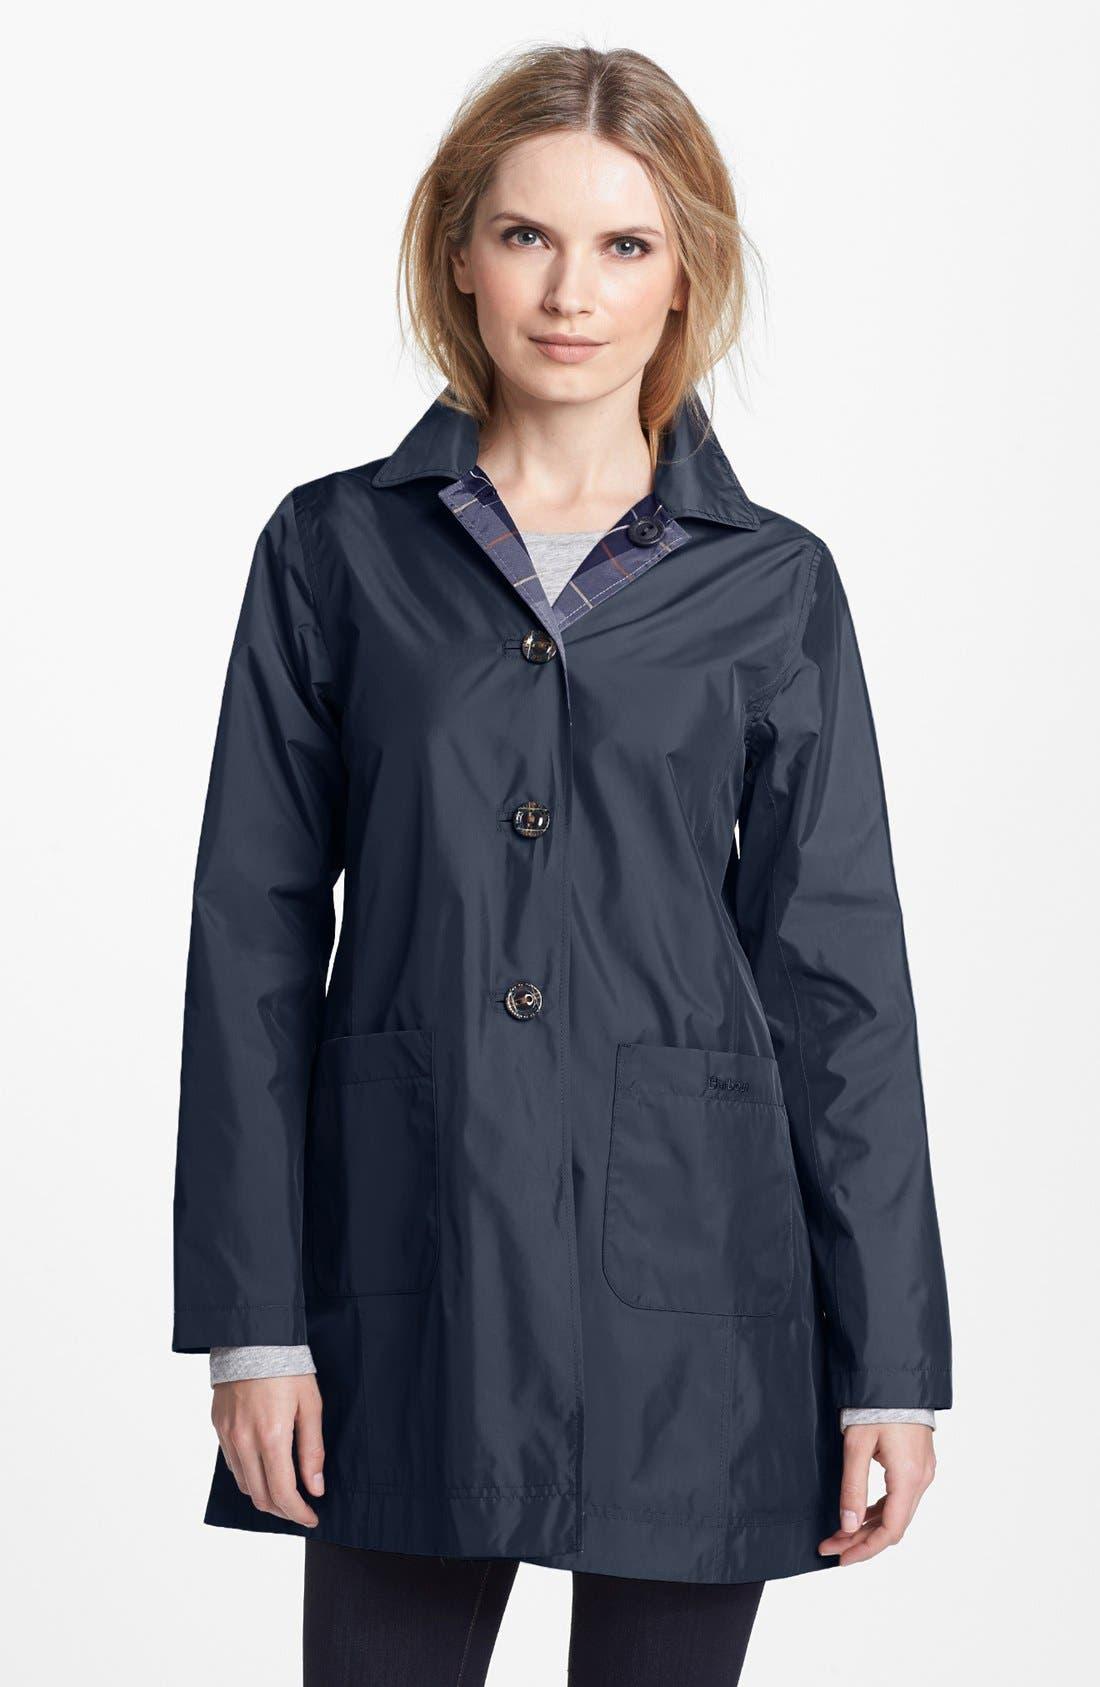 Alternate Image 1 Selected - Barbour 'Derby Mackintosh' Reversible Raincoat